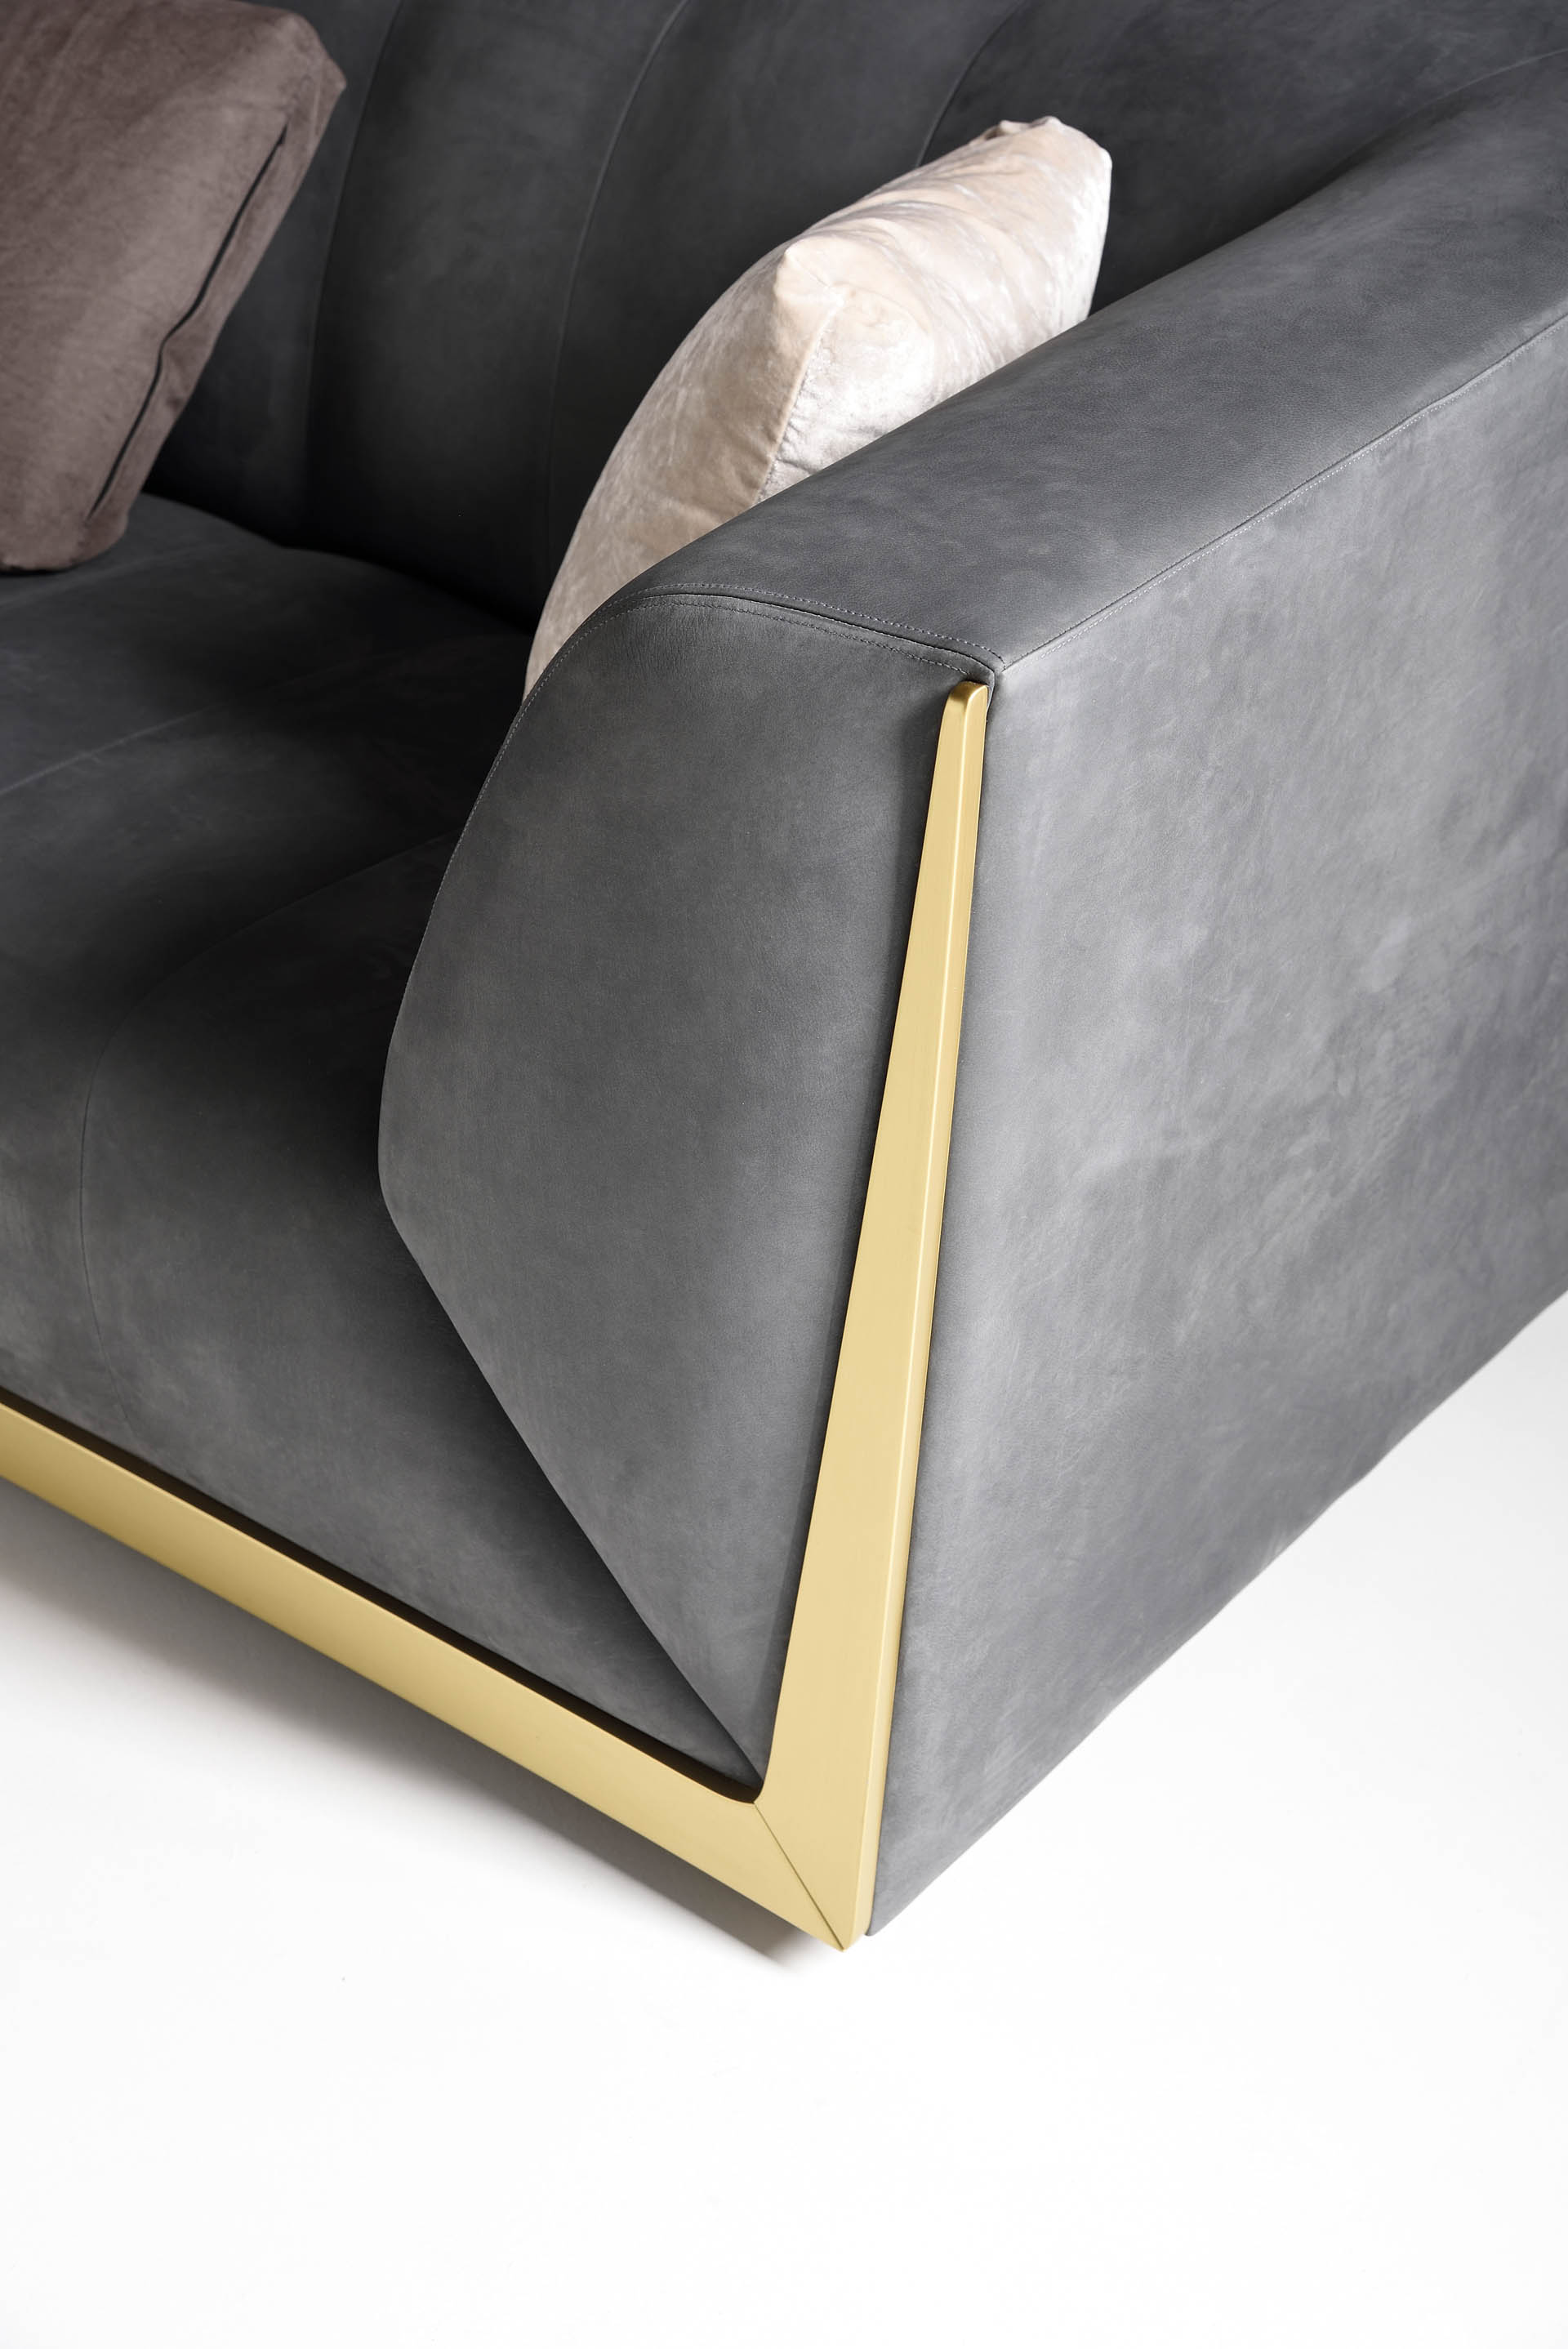 SOFA LATON diseño de mobiliario